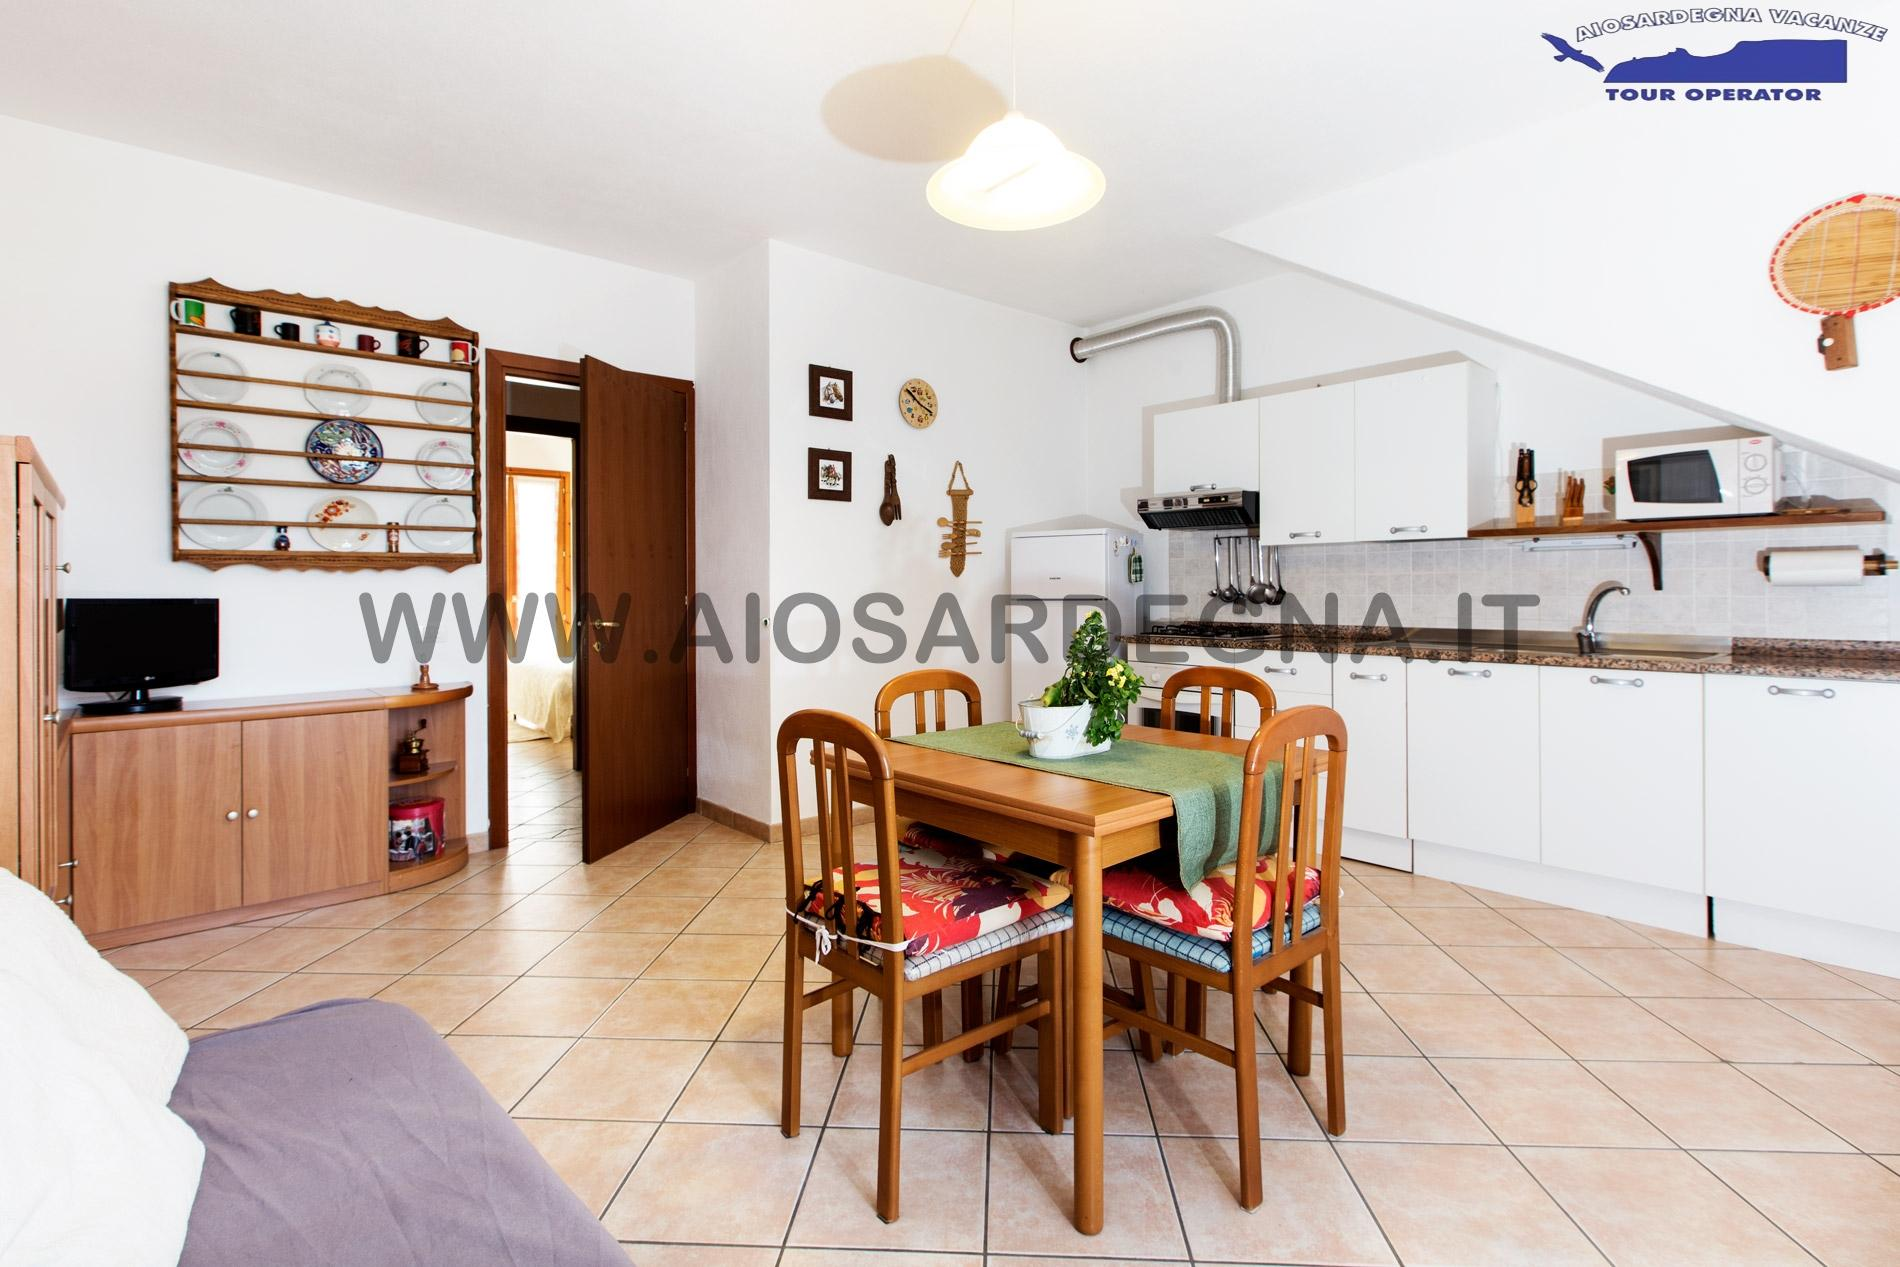 Квартира Сильвия в центре Пулы Юг Сардинии